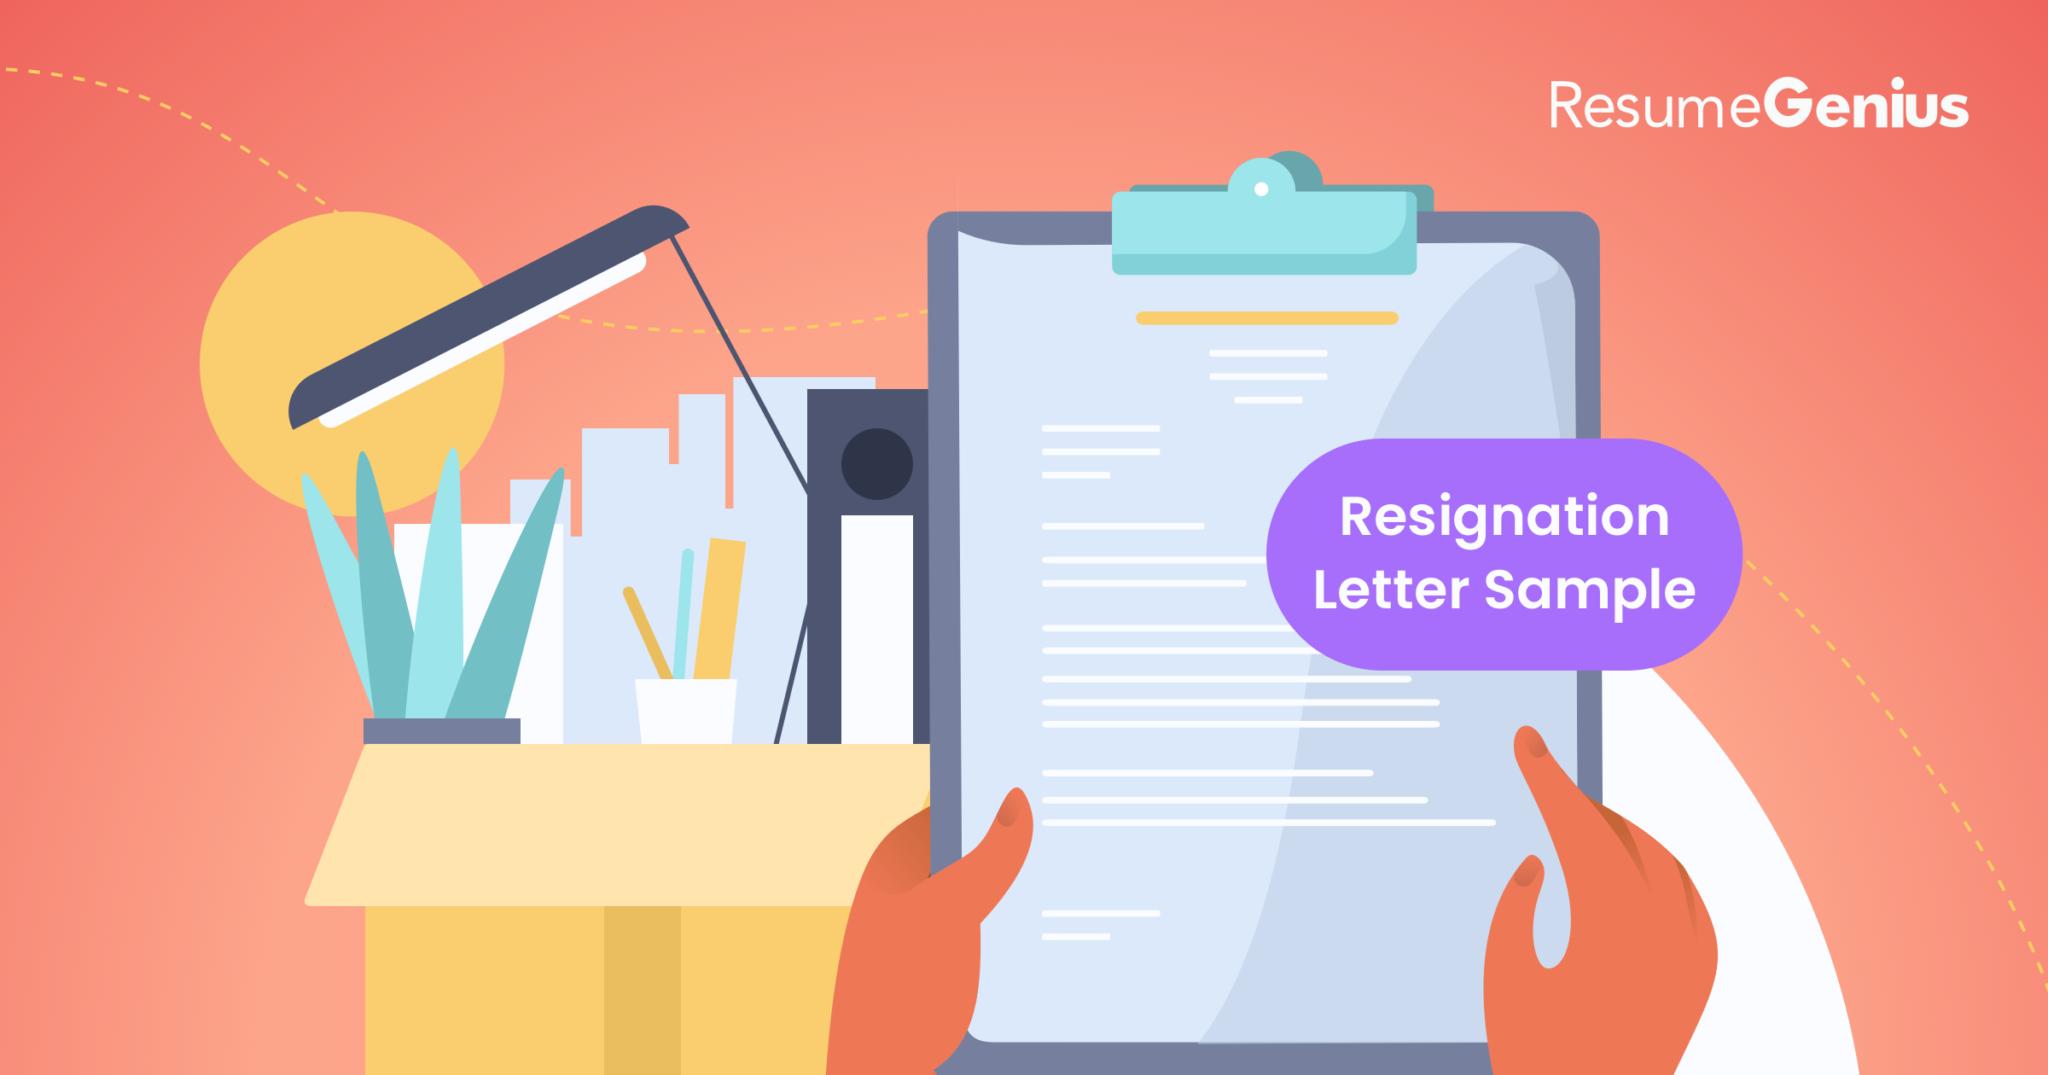 Template For Resignation Letter from resumegenius.com